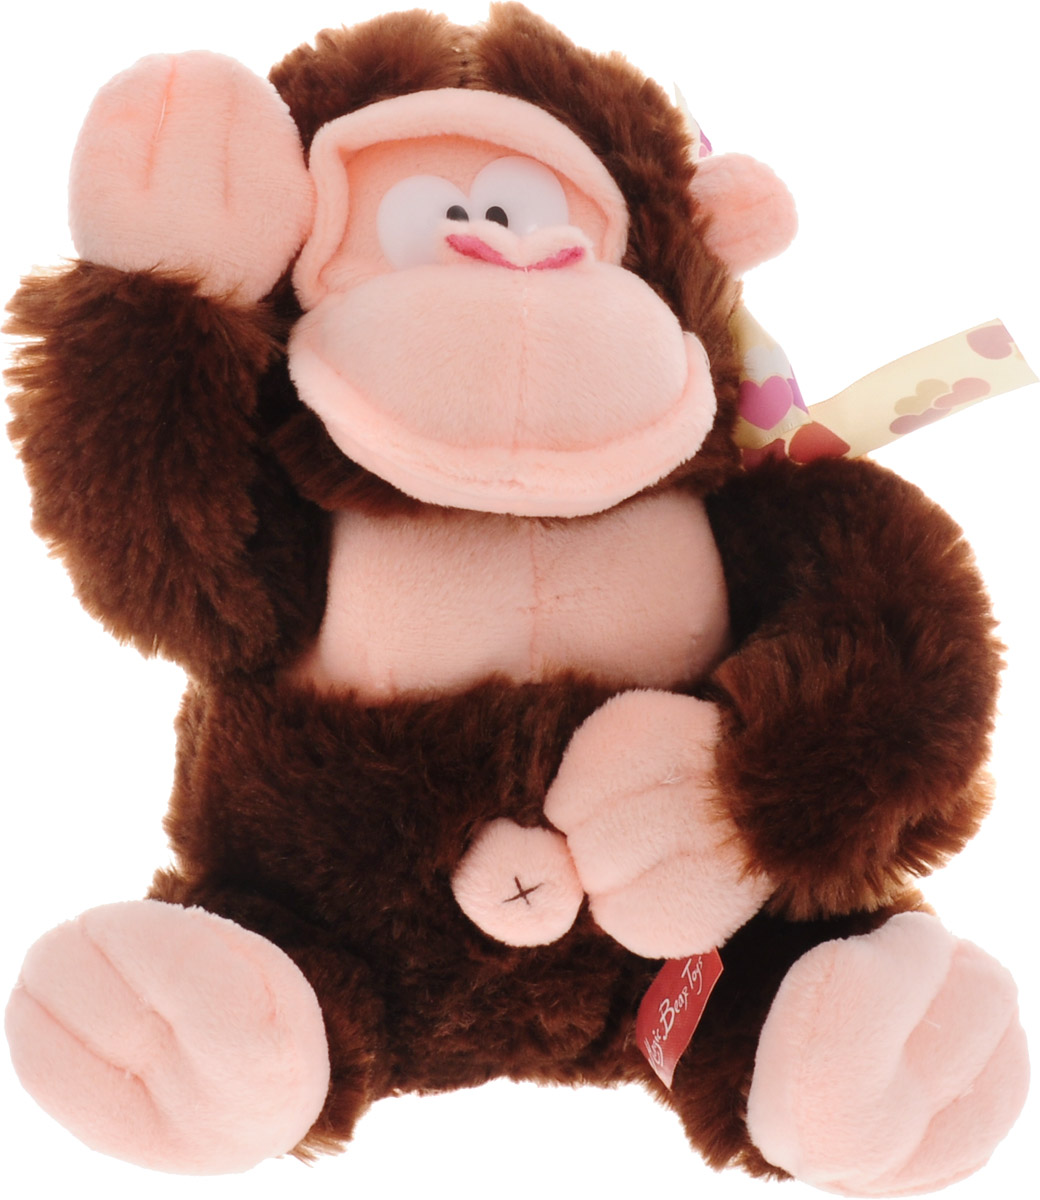 Magic Bear Toys Мягкая игрушка Обезьяна Федот цвет темно-коричневый 20 см 6es7953 8lj31 0aa0 6es7 953 8lj31 0aa0 simatic s7 micro memory card f s7 300 c7 et 200 3 3 v nflash 512 kb new in box